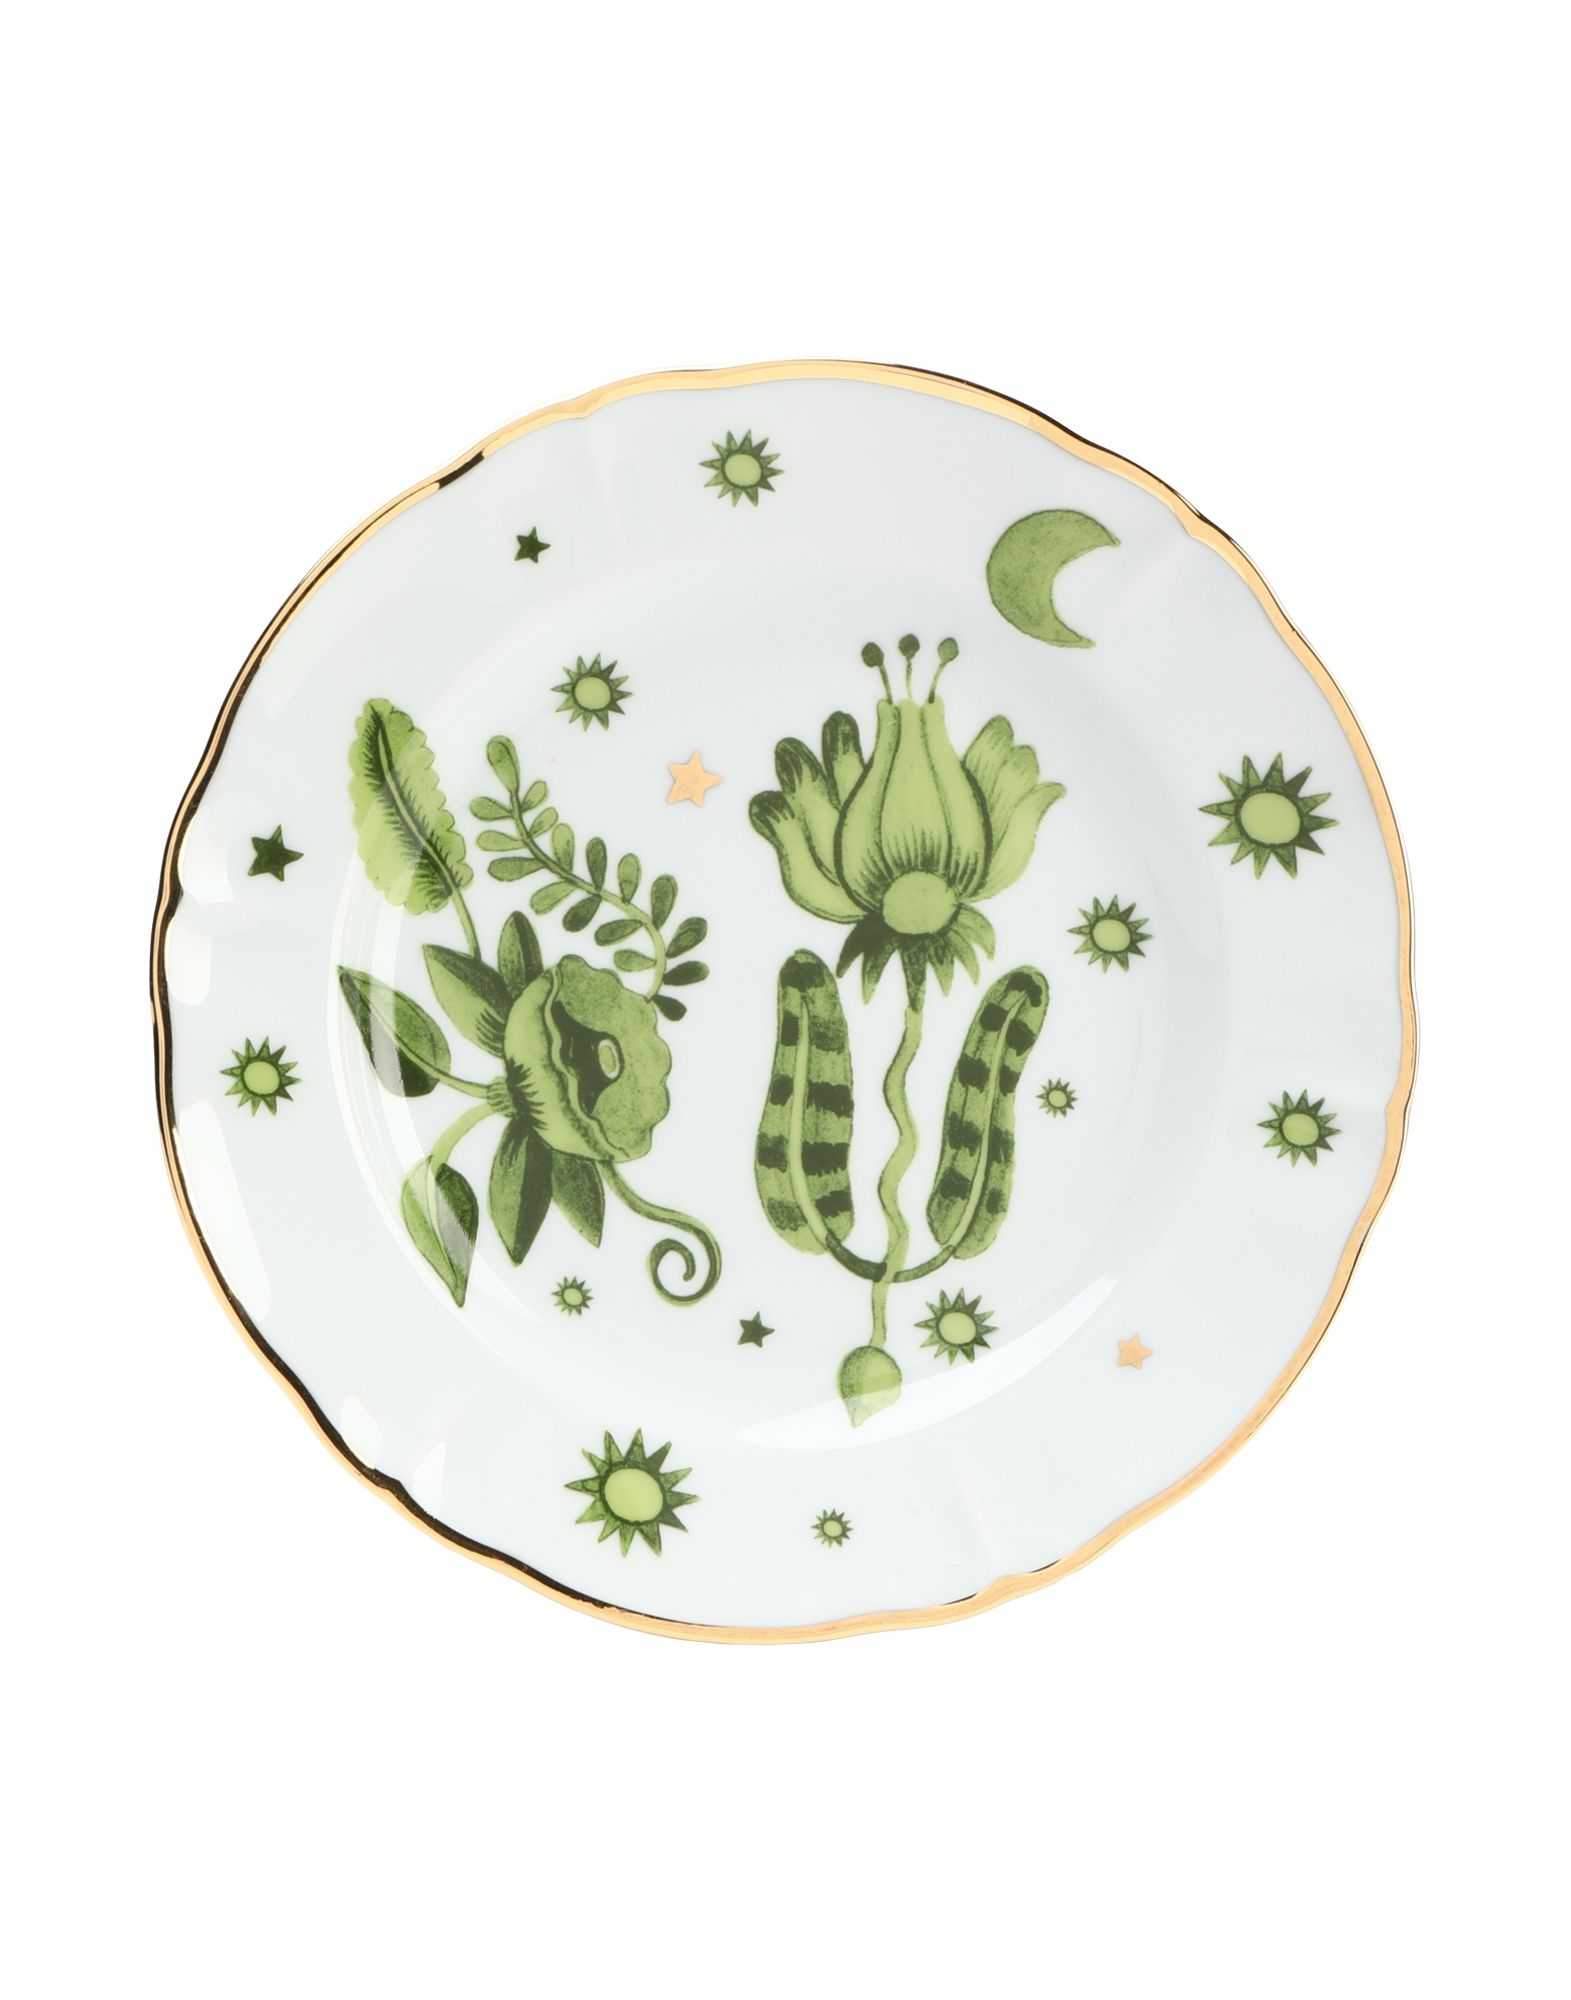 BITOSSI HOME Декоративная тарелка тарелка декоративная best home porcelain святой источник 18 5 см